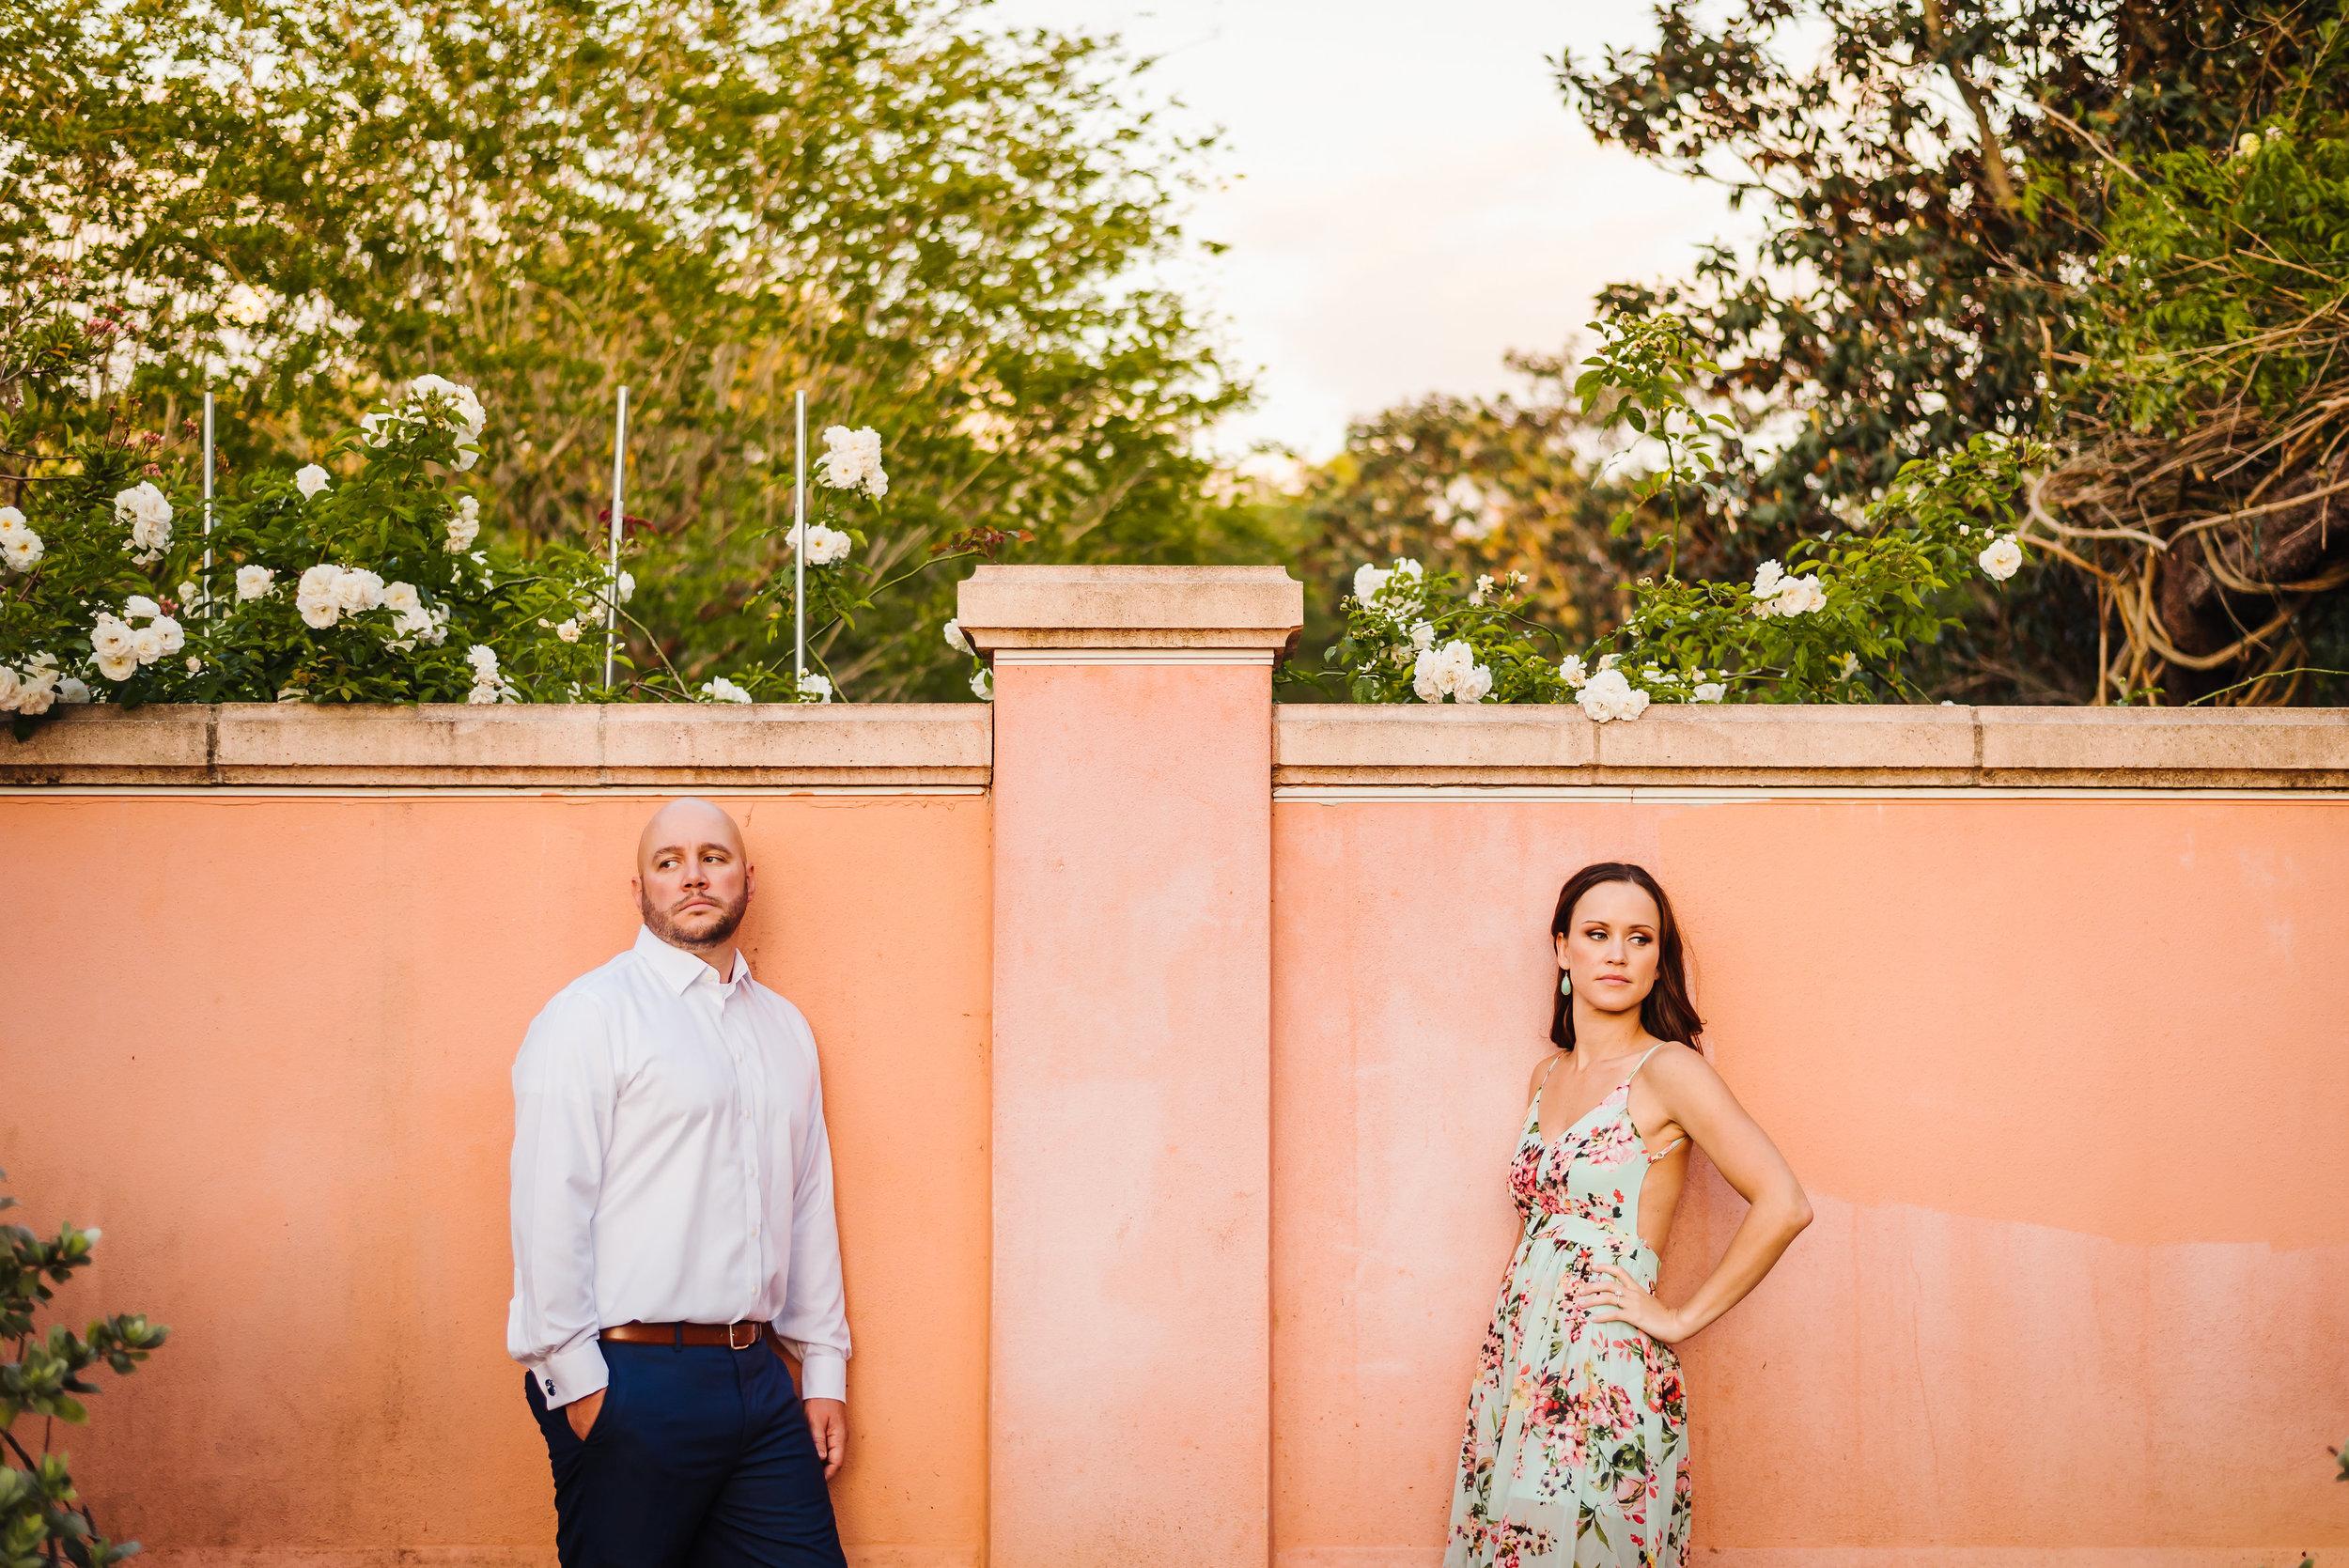 Tampa-Engagement-Photographer-Sunset-Park-Romantic.jpg